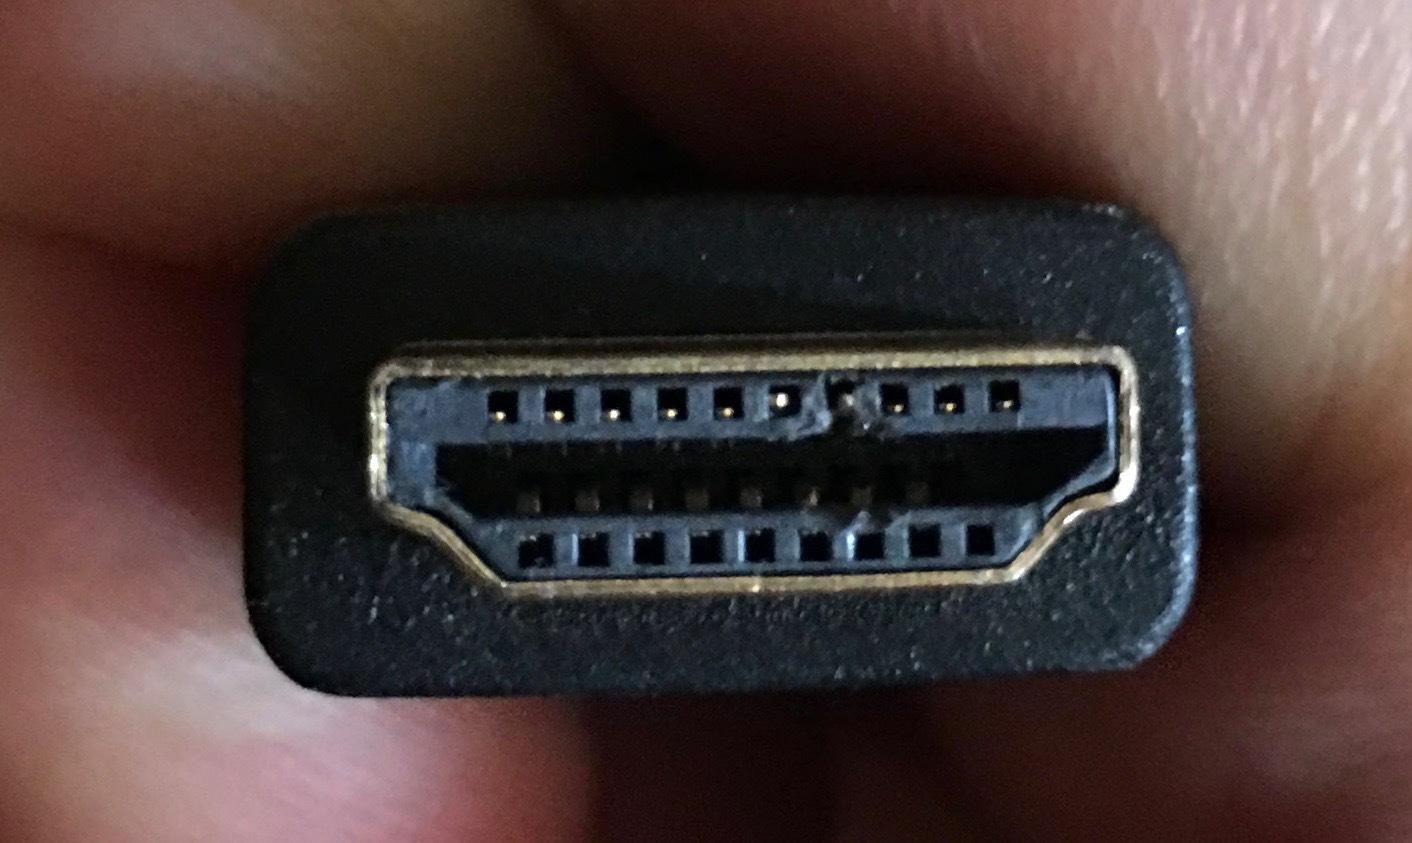 [WIP] : MiSTer FPGA dans un boitier custom - Page 2 IMG_0710